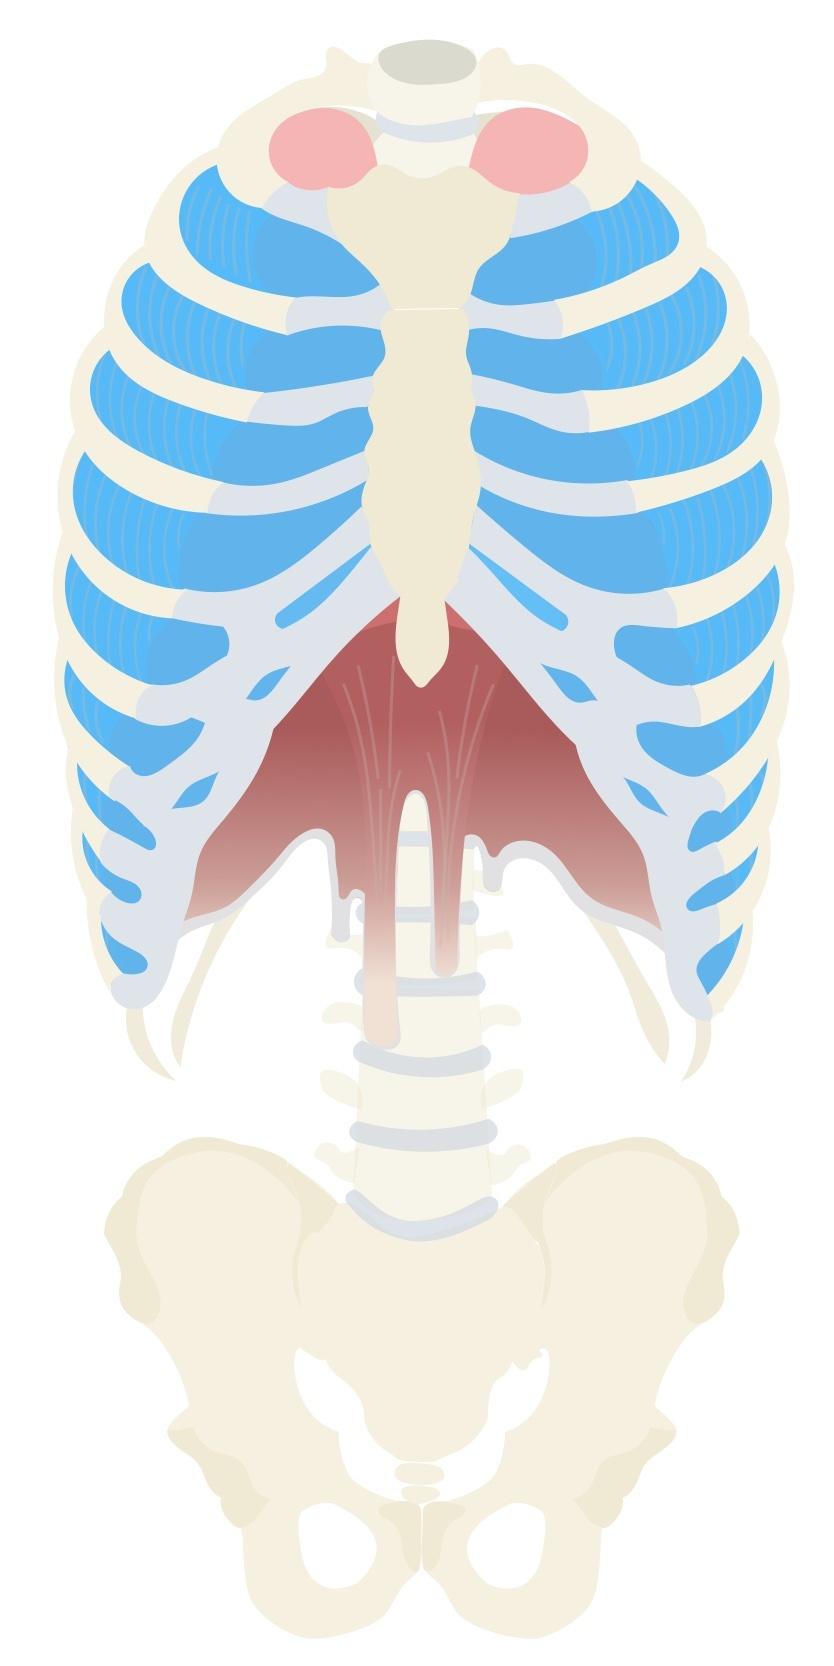 External intercostal anatomy